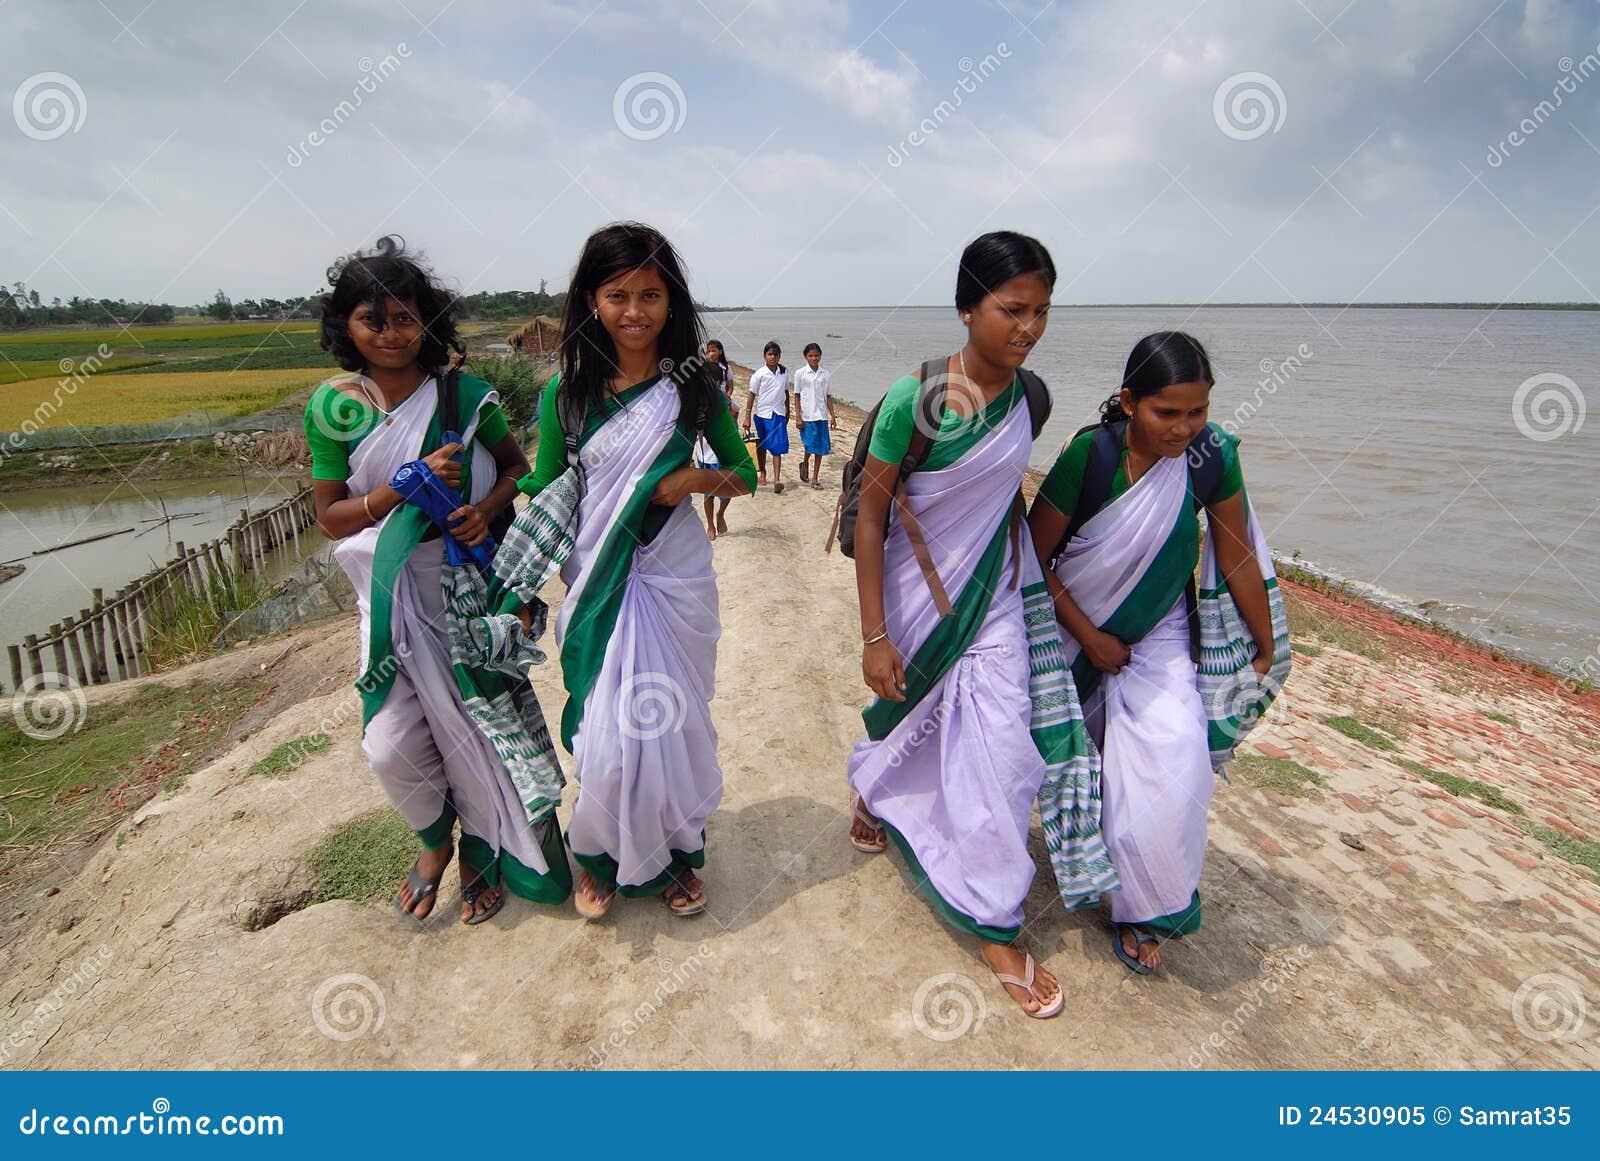 April 202012 Amlamethigosabasundarbanwest Bengalindiaasia A Group Of School Girl Walking On A River Embankment At Sundarban